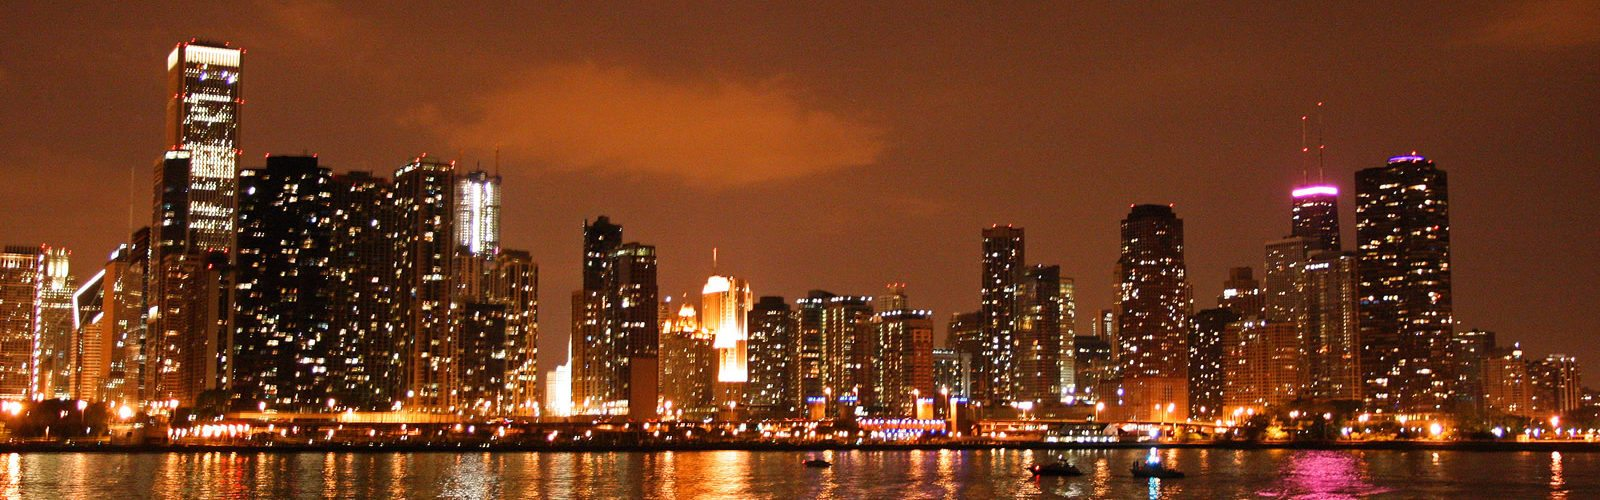 visiter-decouvrir-chicago-nuit-nocturne-activites-une